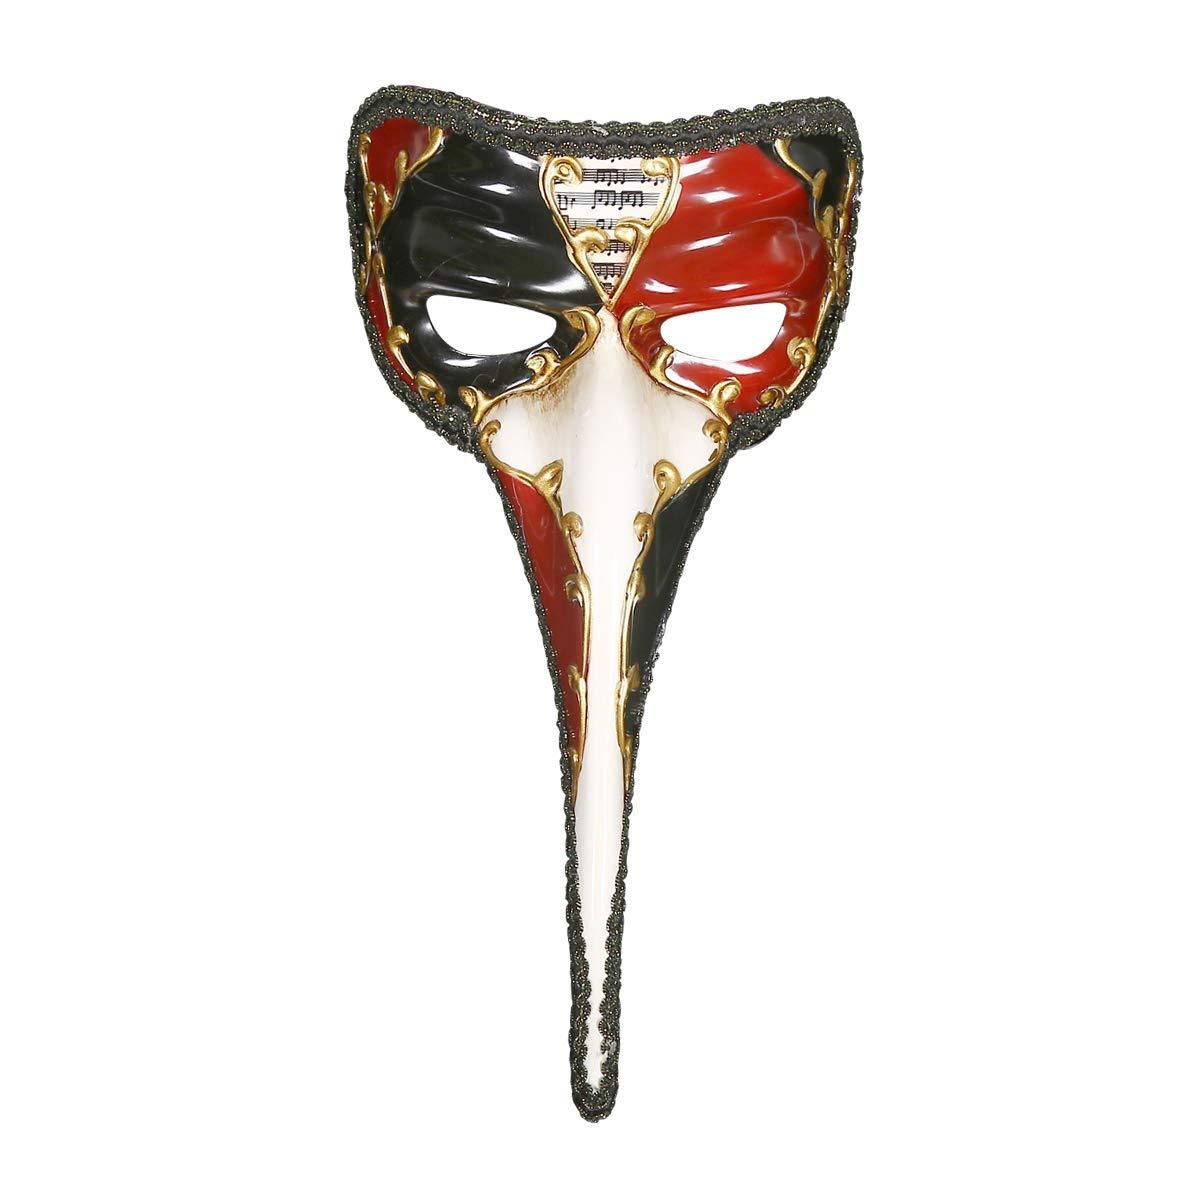 QWhing Festival-Maske Maskerade Halloween-Maske Ganze Person Kleine Lange Nase Handgemalte Maske Kostüm Maske (Farbe : Red)